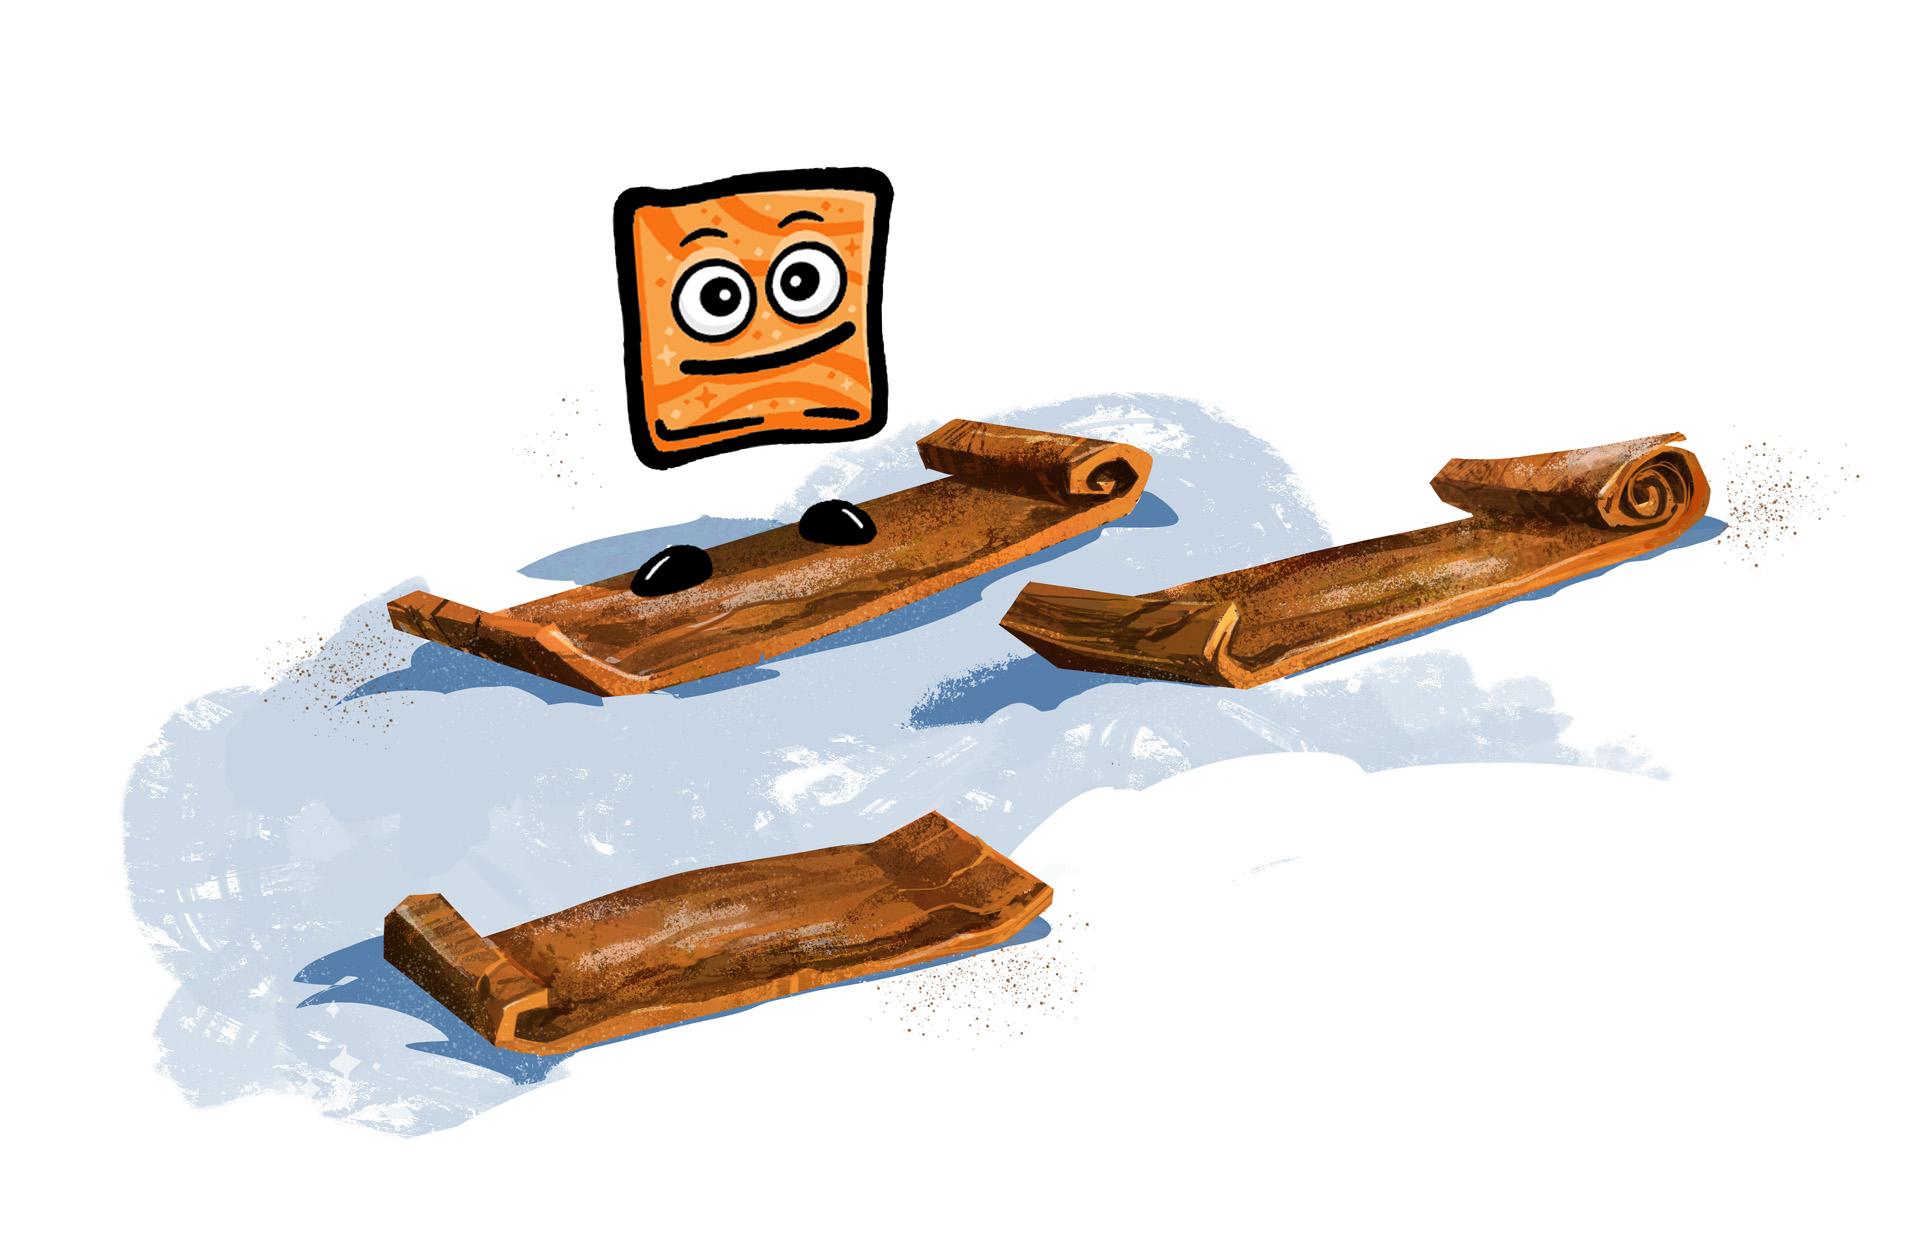 CTC_crunchride_design_snowboards_v2.jpg